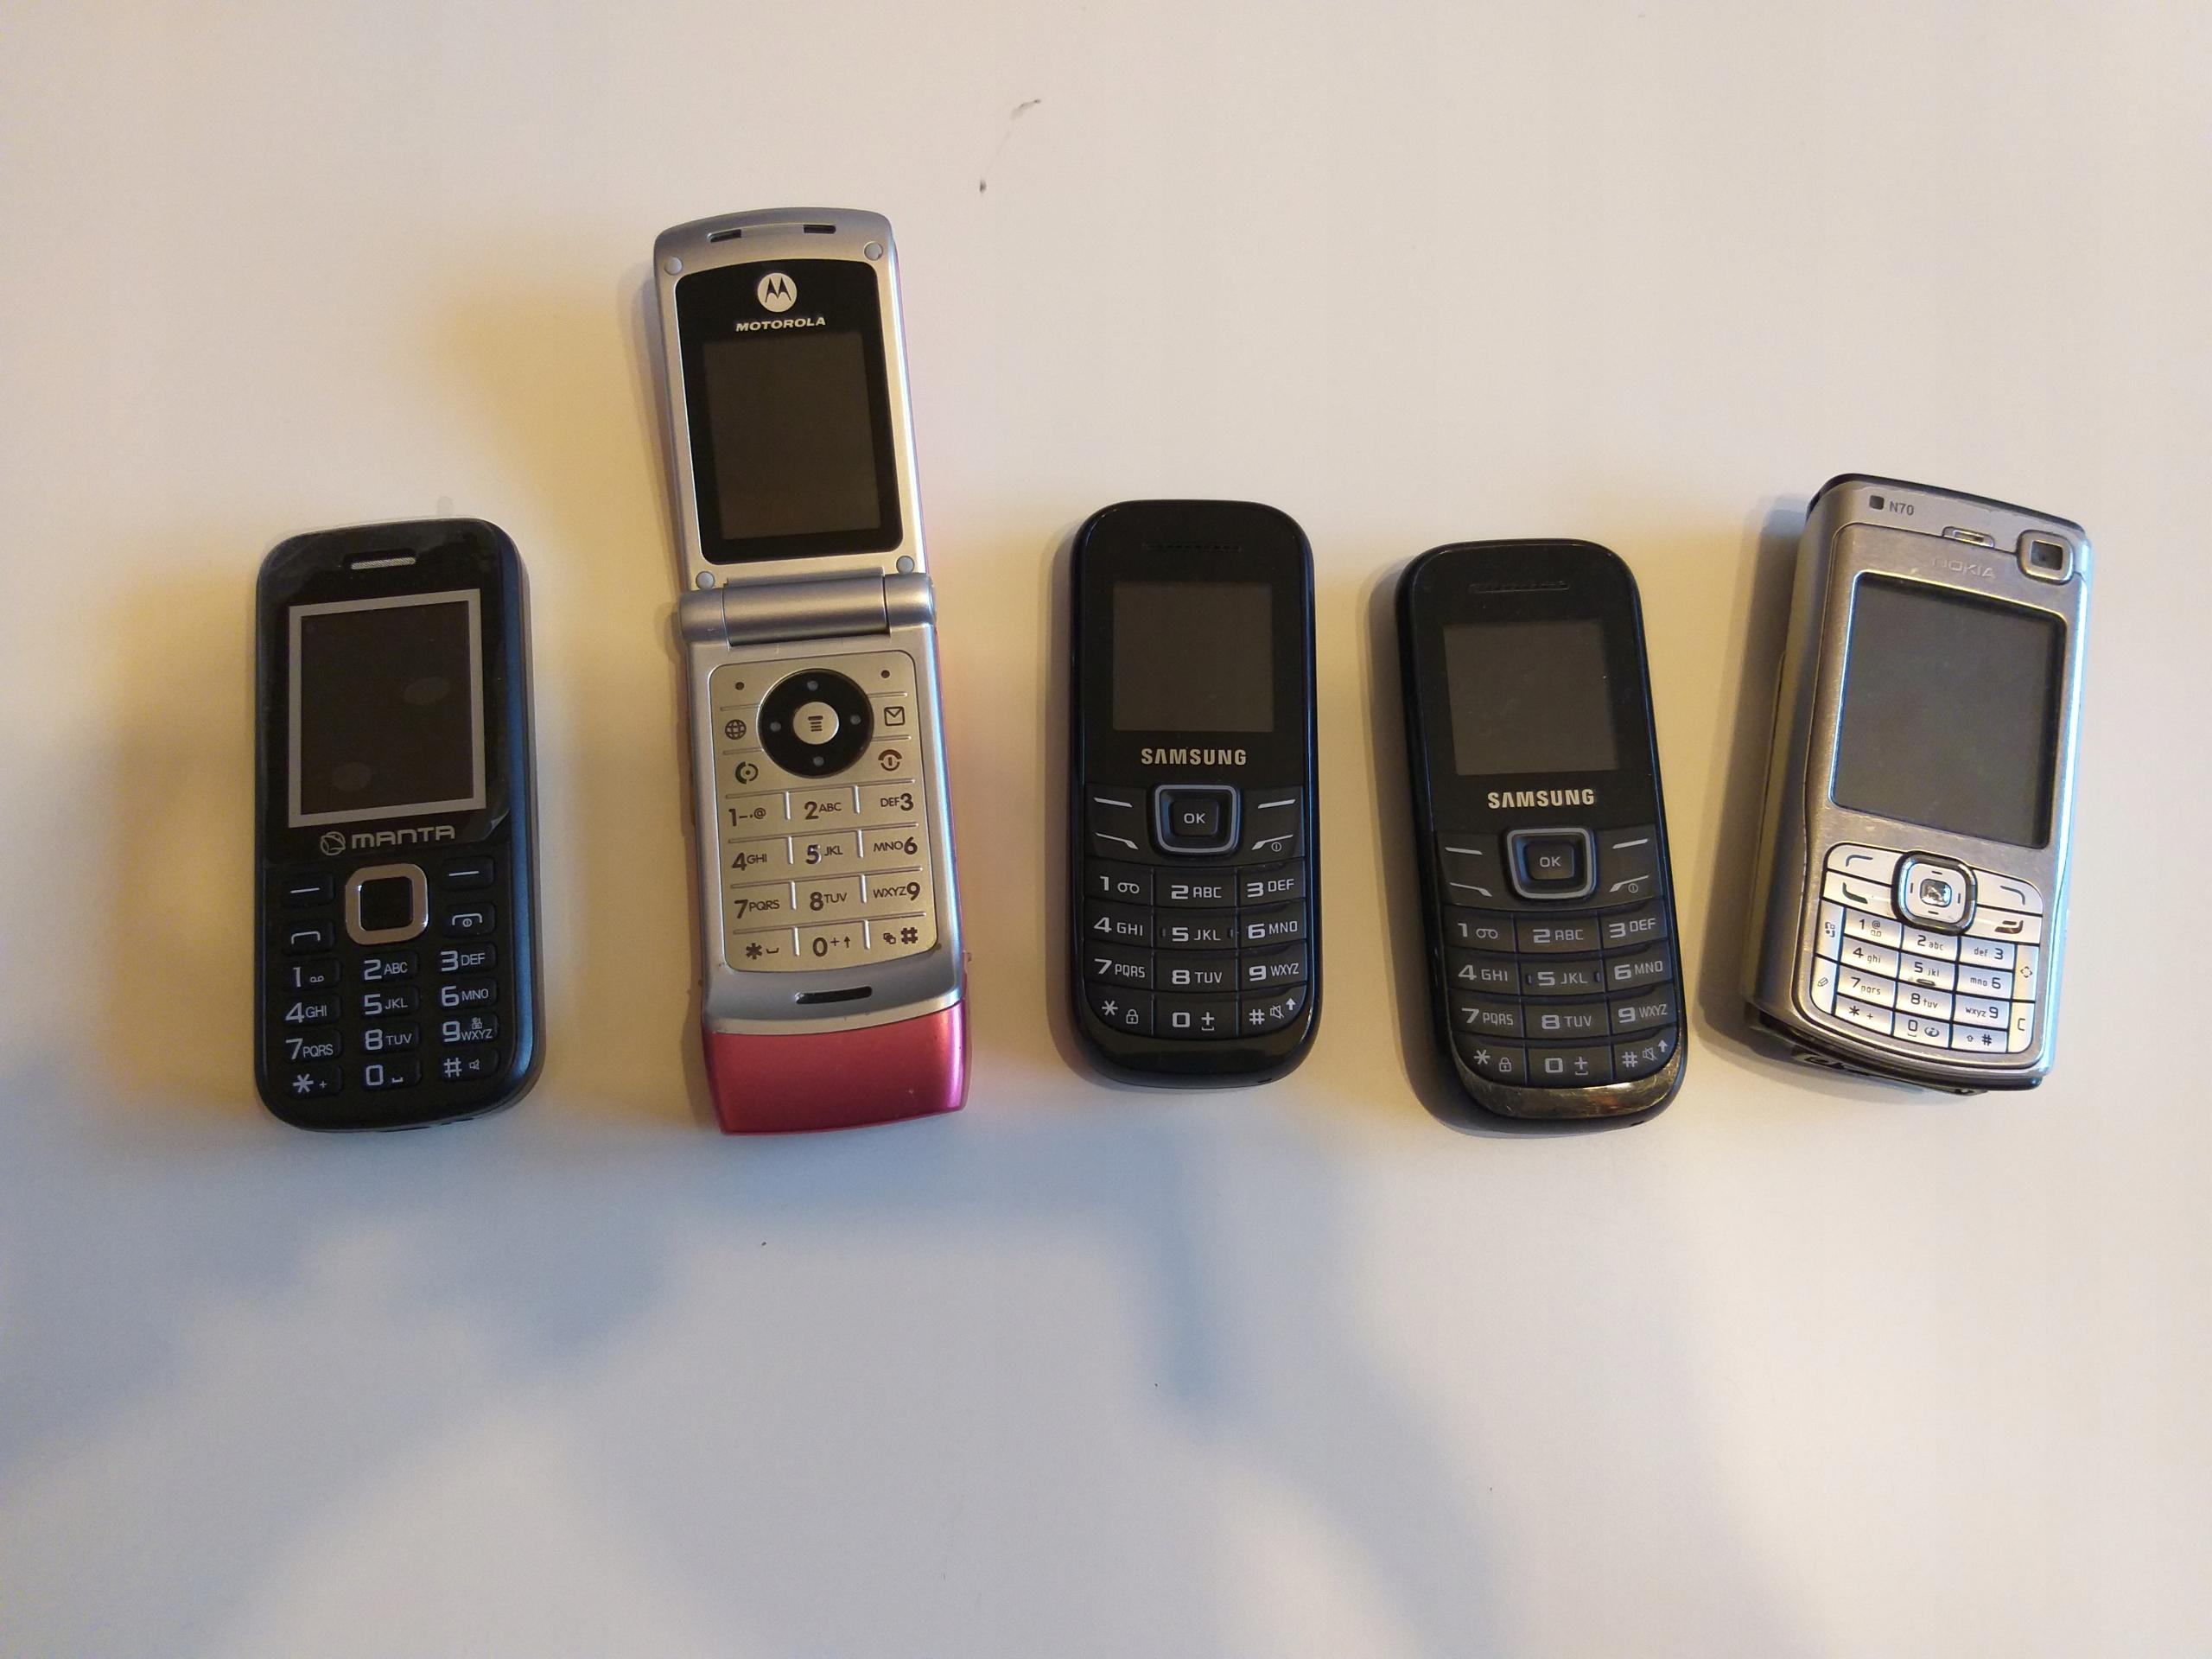 samsung nokia n70 motorola w375 telefony stare